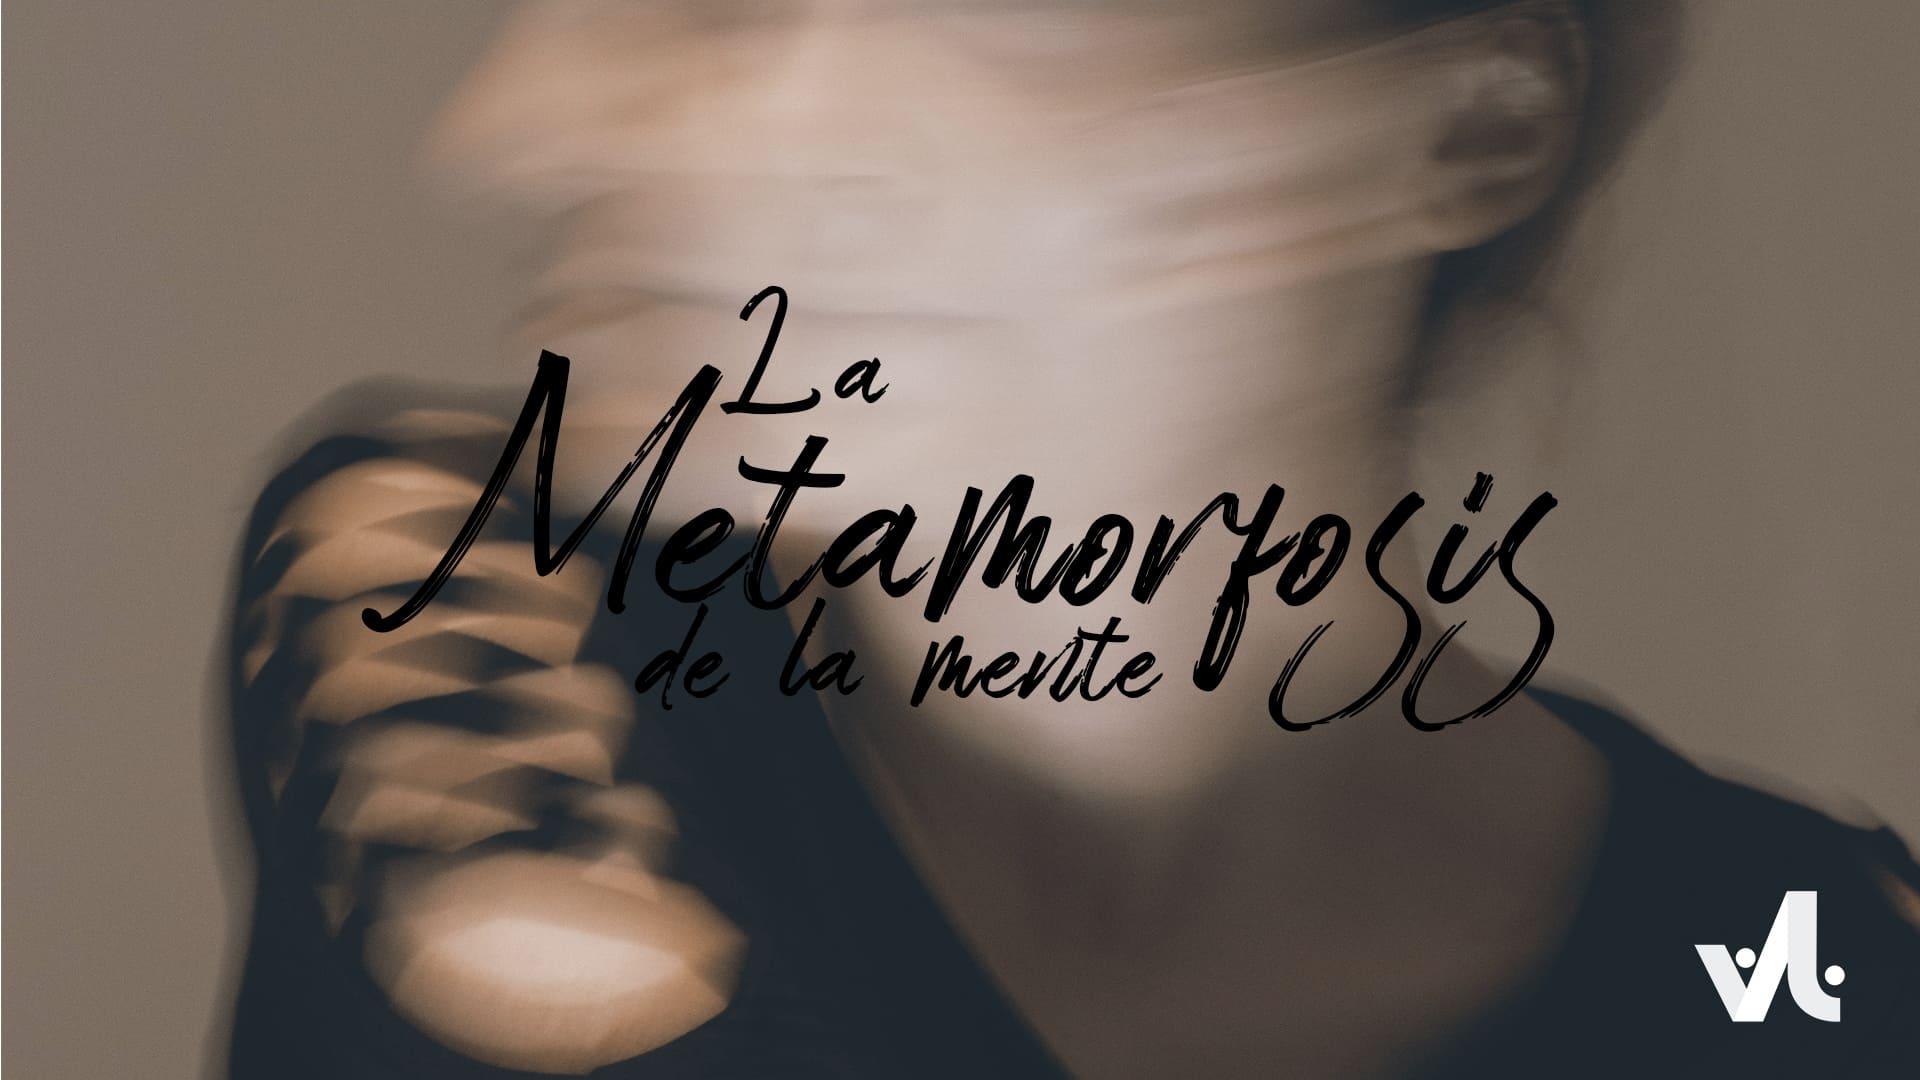 La Metamorfosis de la Mente